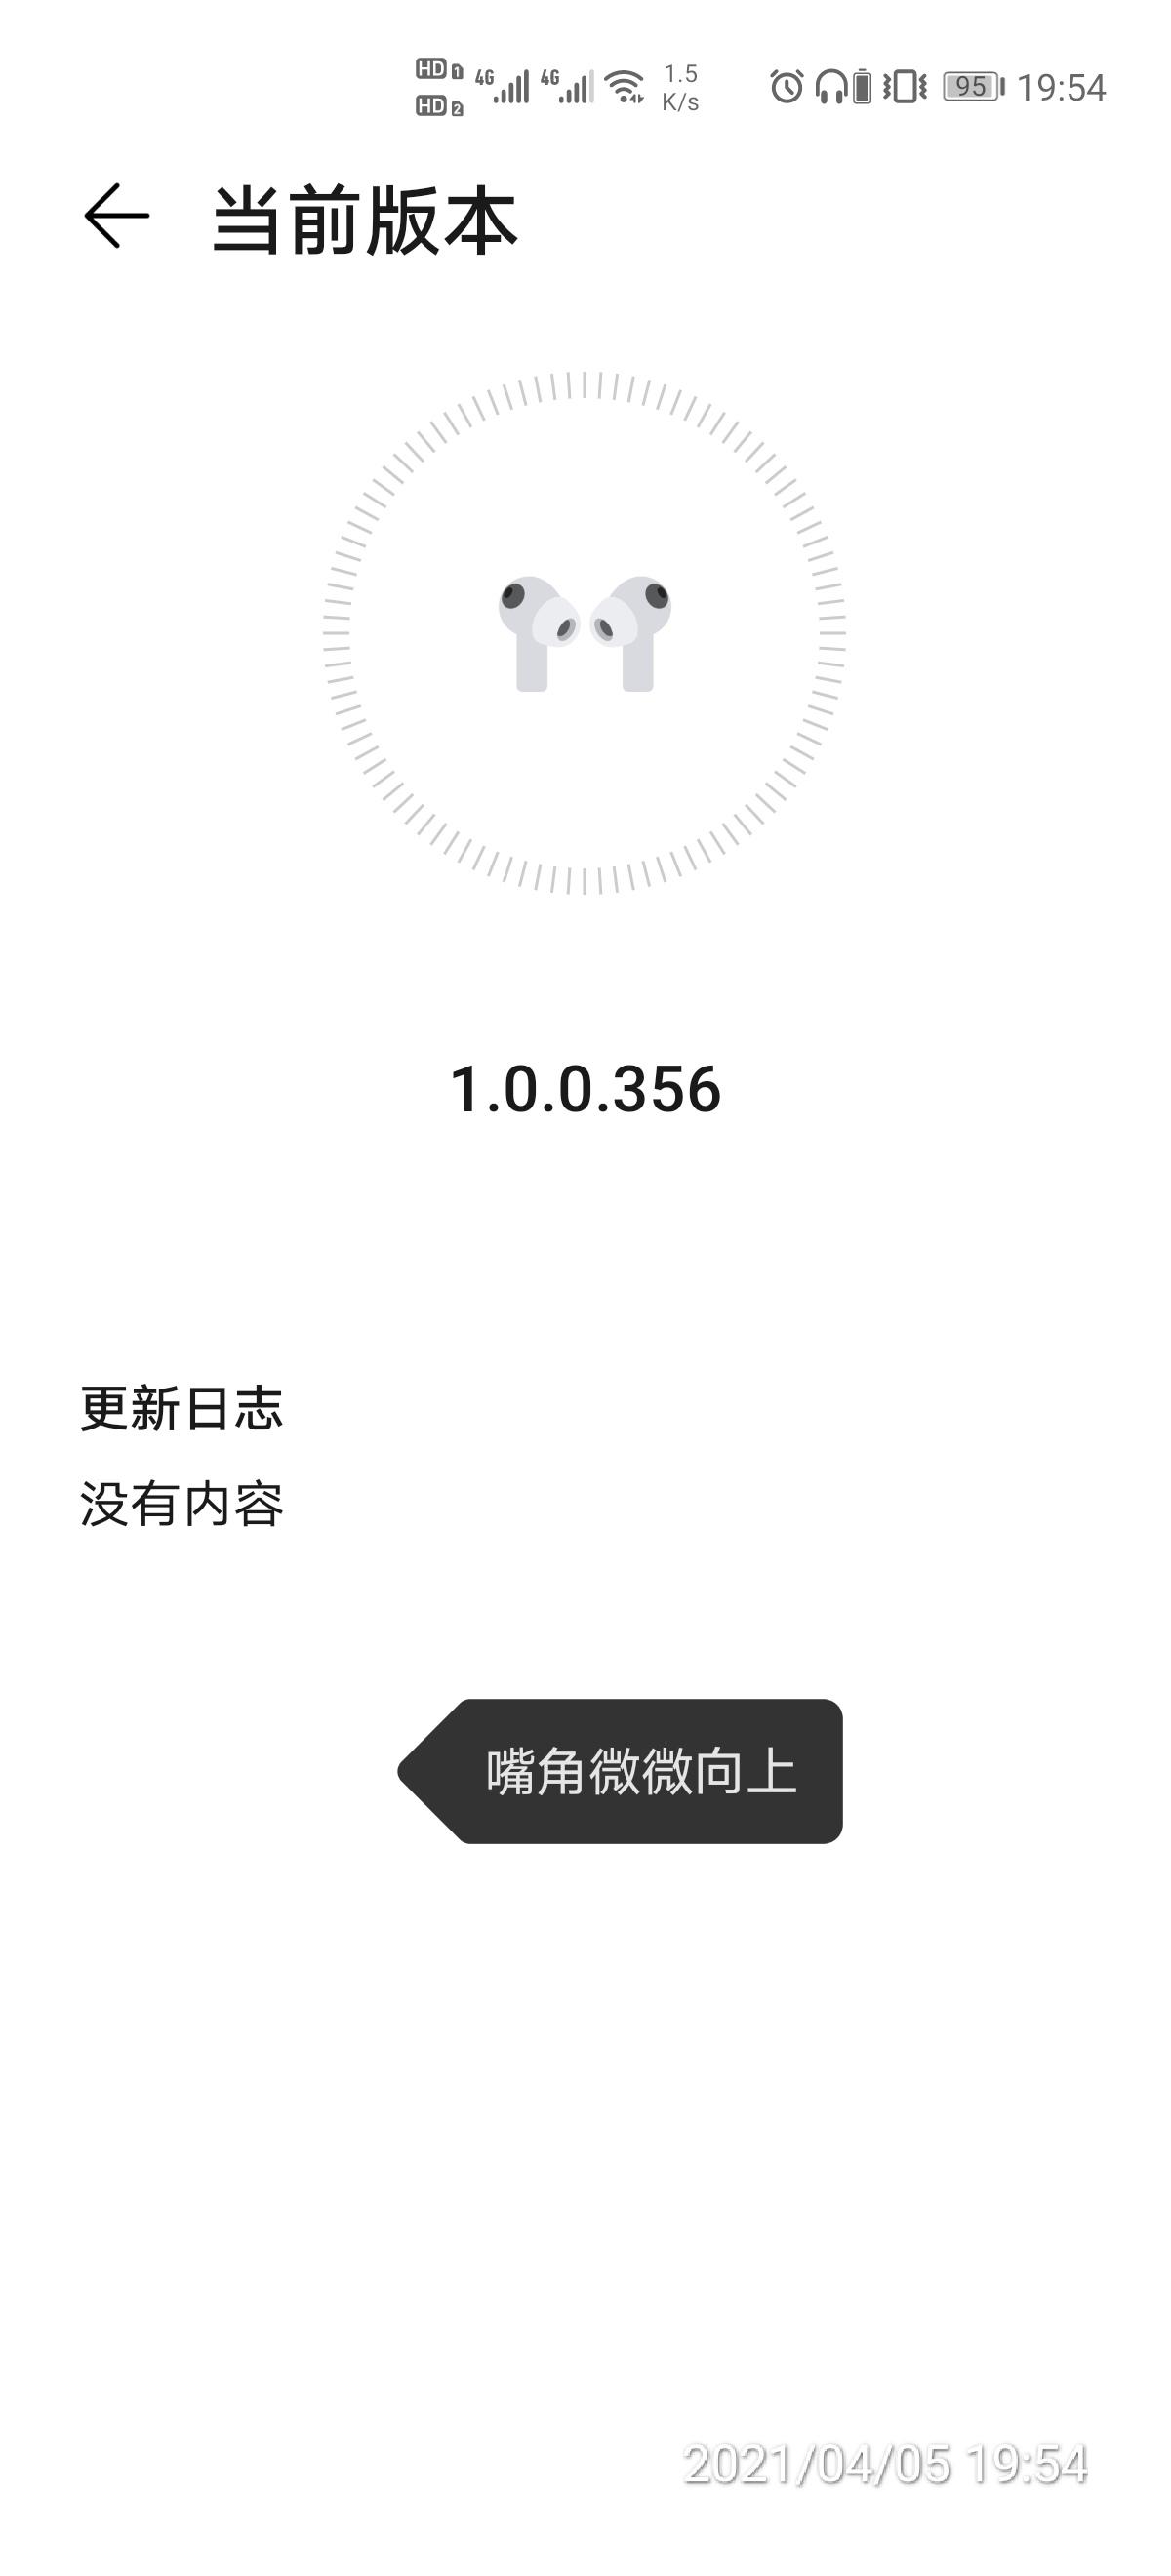 Screenshot_20210405_195428_com.huawei.smarthome_edit_445792102216351.jpg